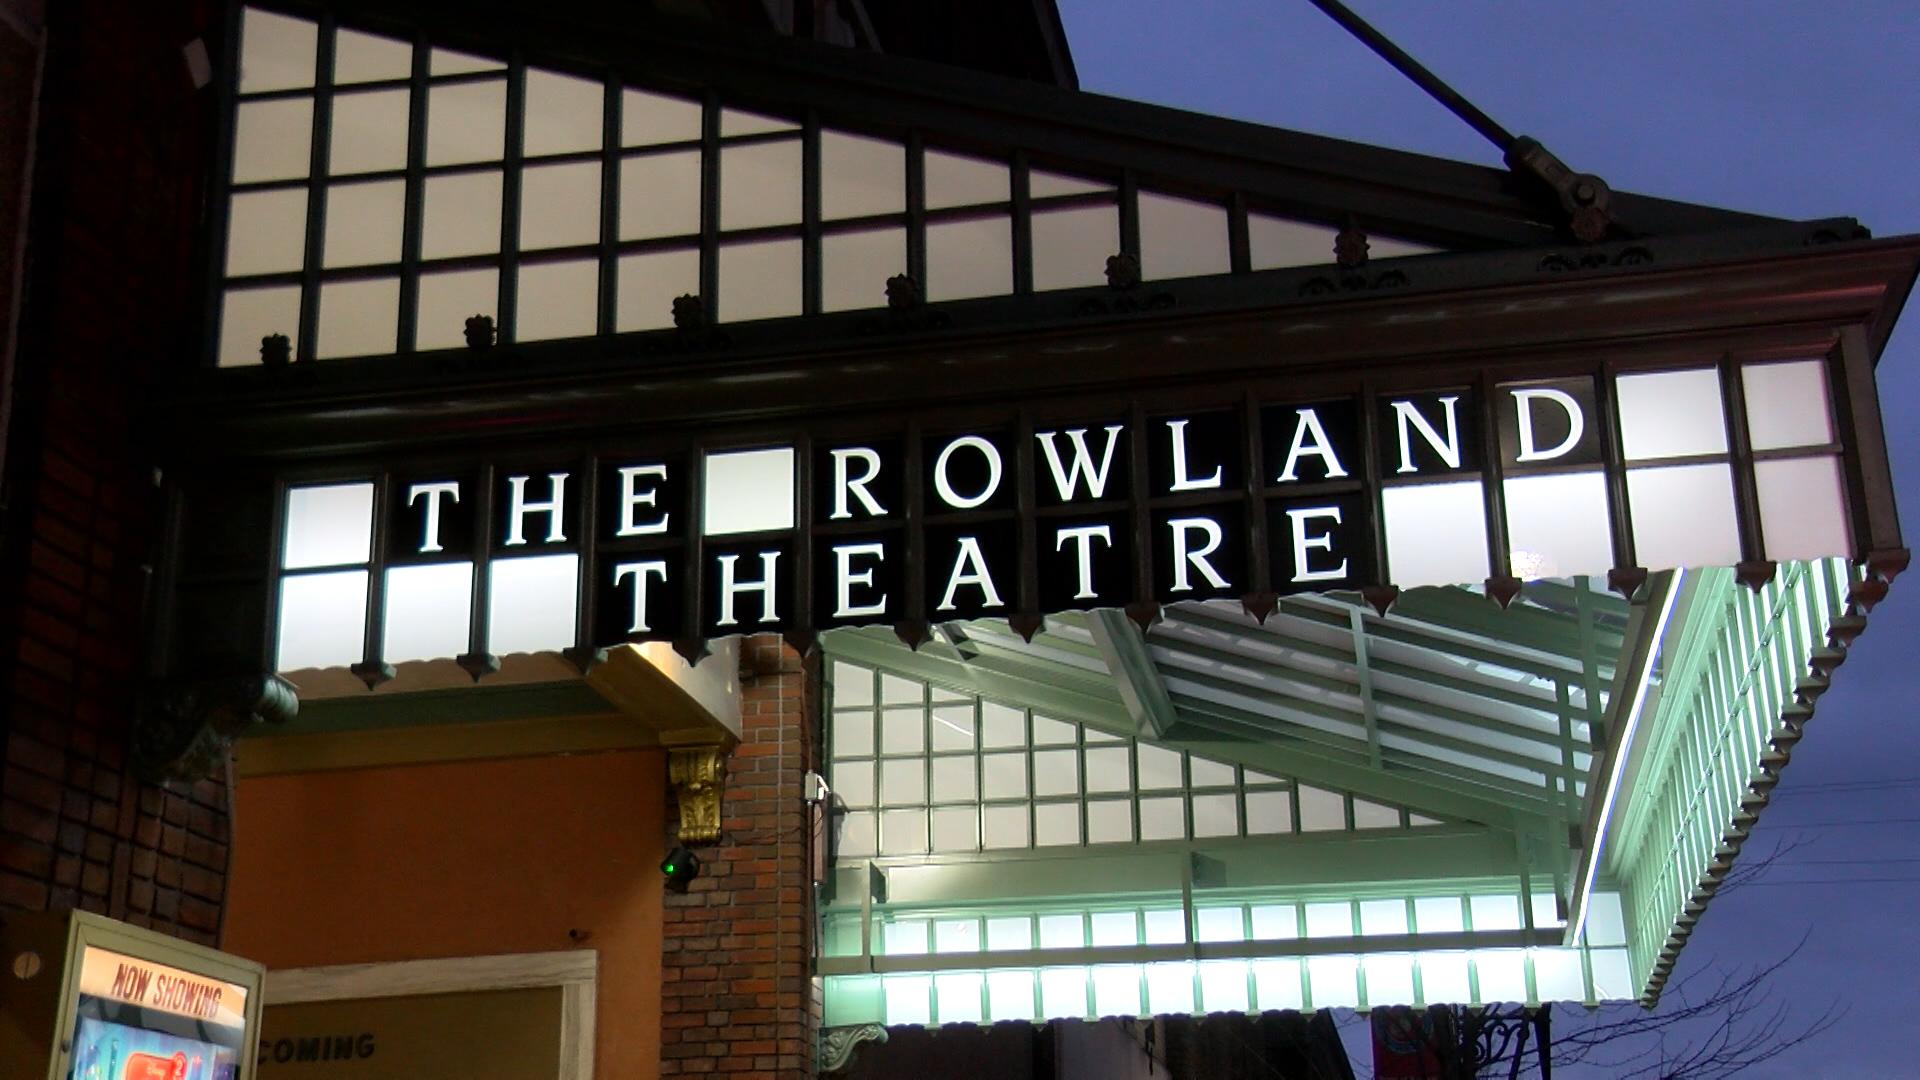 rowland theatre_1543279666778.jpg.jpg